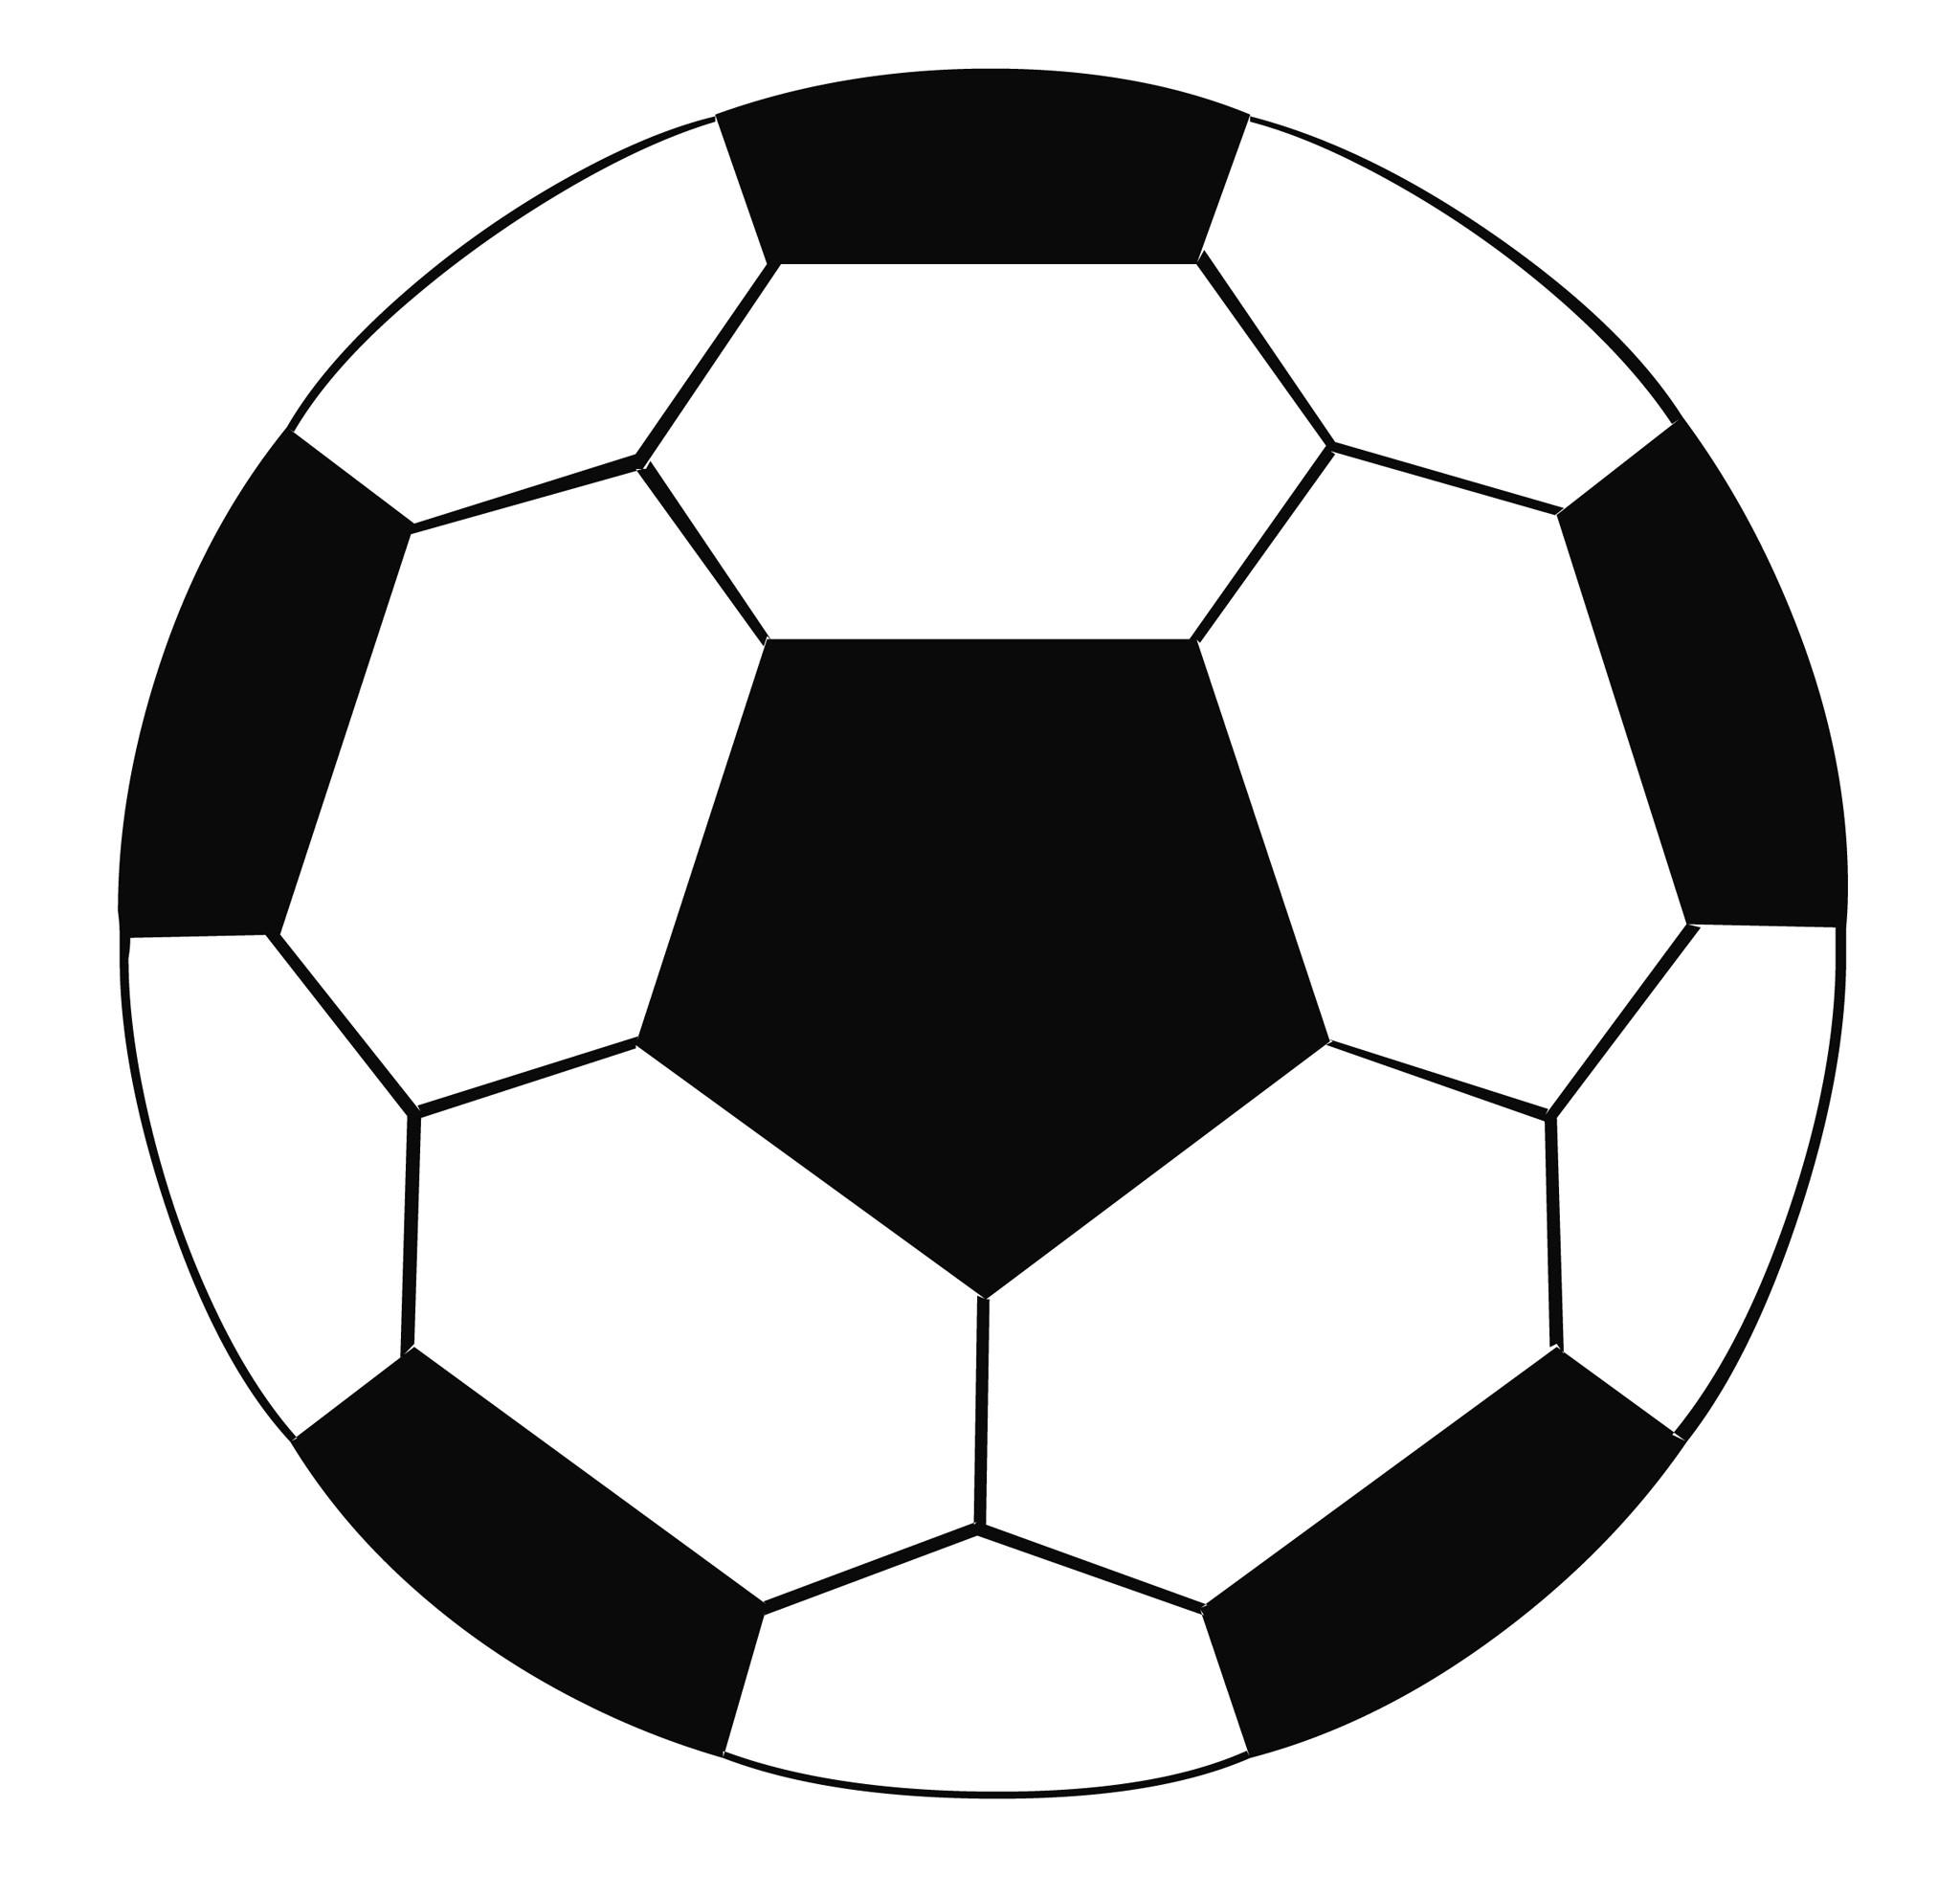 ... clip art soccer ball; Free ...-... clip art soccer ball; Free ...-4